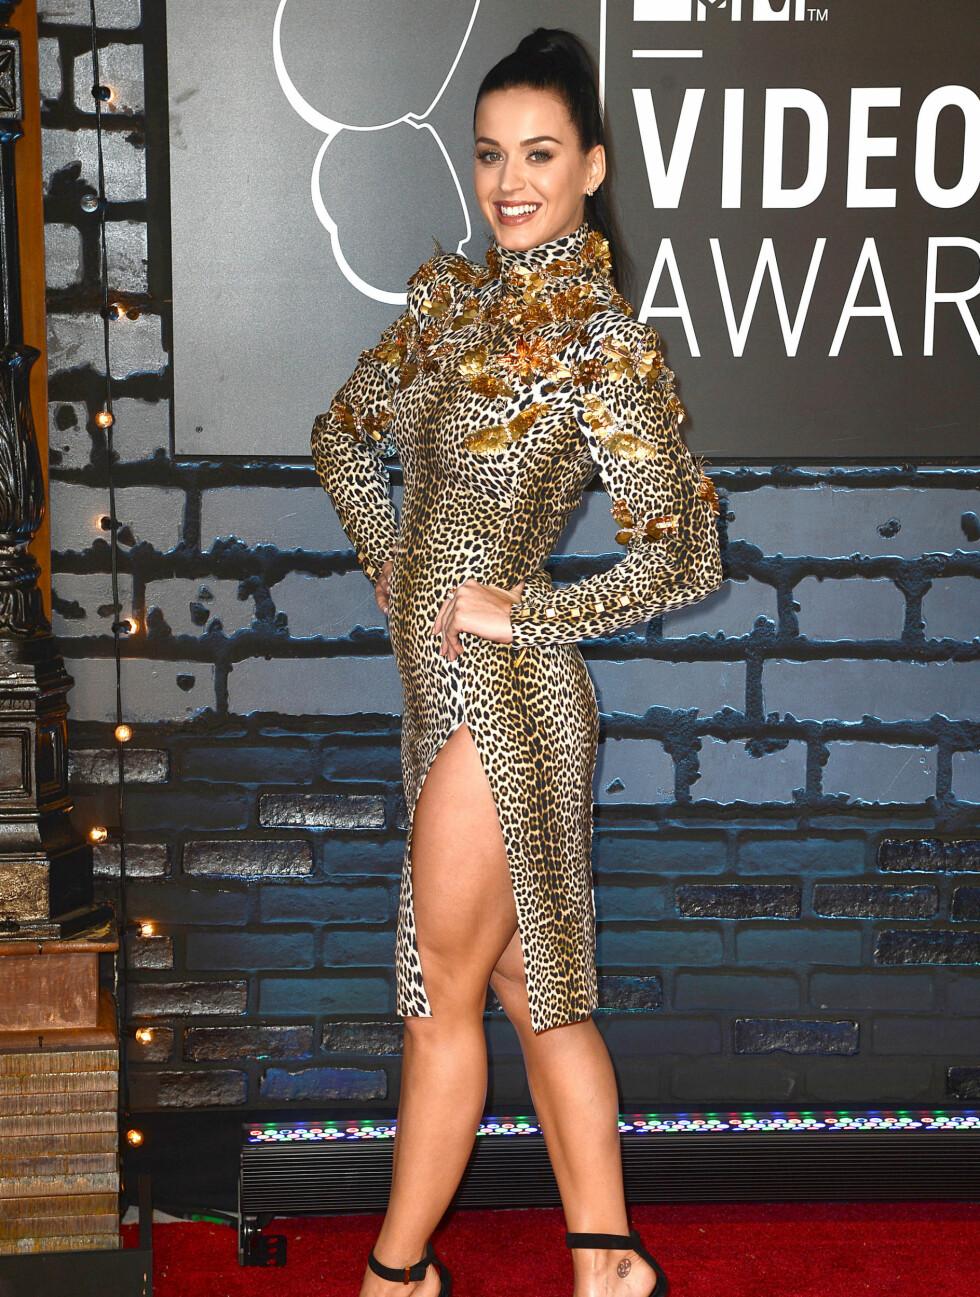 MTV MUSIC VIDEO AWARDS 2013: Popstjernen Katy Perry kjole med leopardprint fra Emanuel Ungaro. Foto: All Access Photo / Splash News/ All Over Press